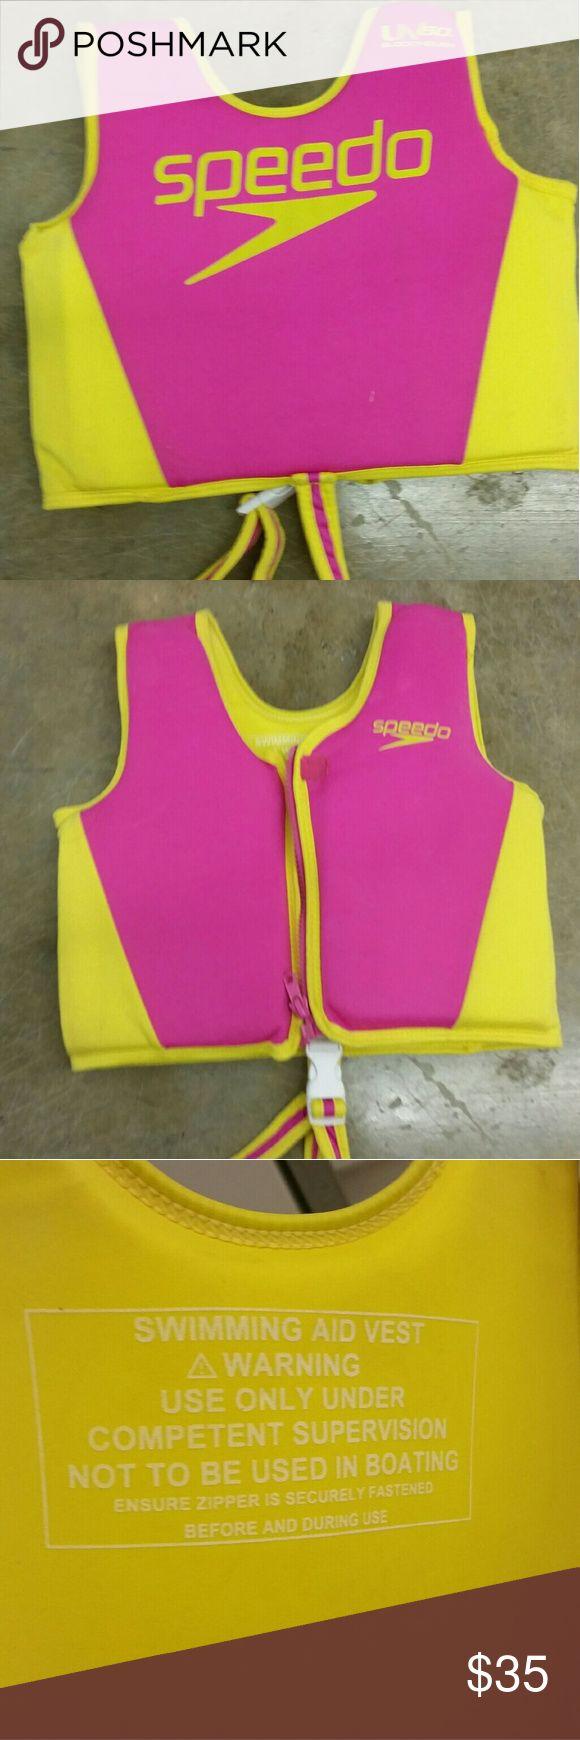 Speedo Neoprene Life Jacket Child Size  30-45 lbs Speedo Neoprene Life Jacket Child Size  30-45 lbs speedo Swim